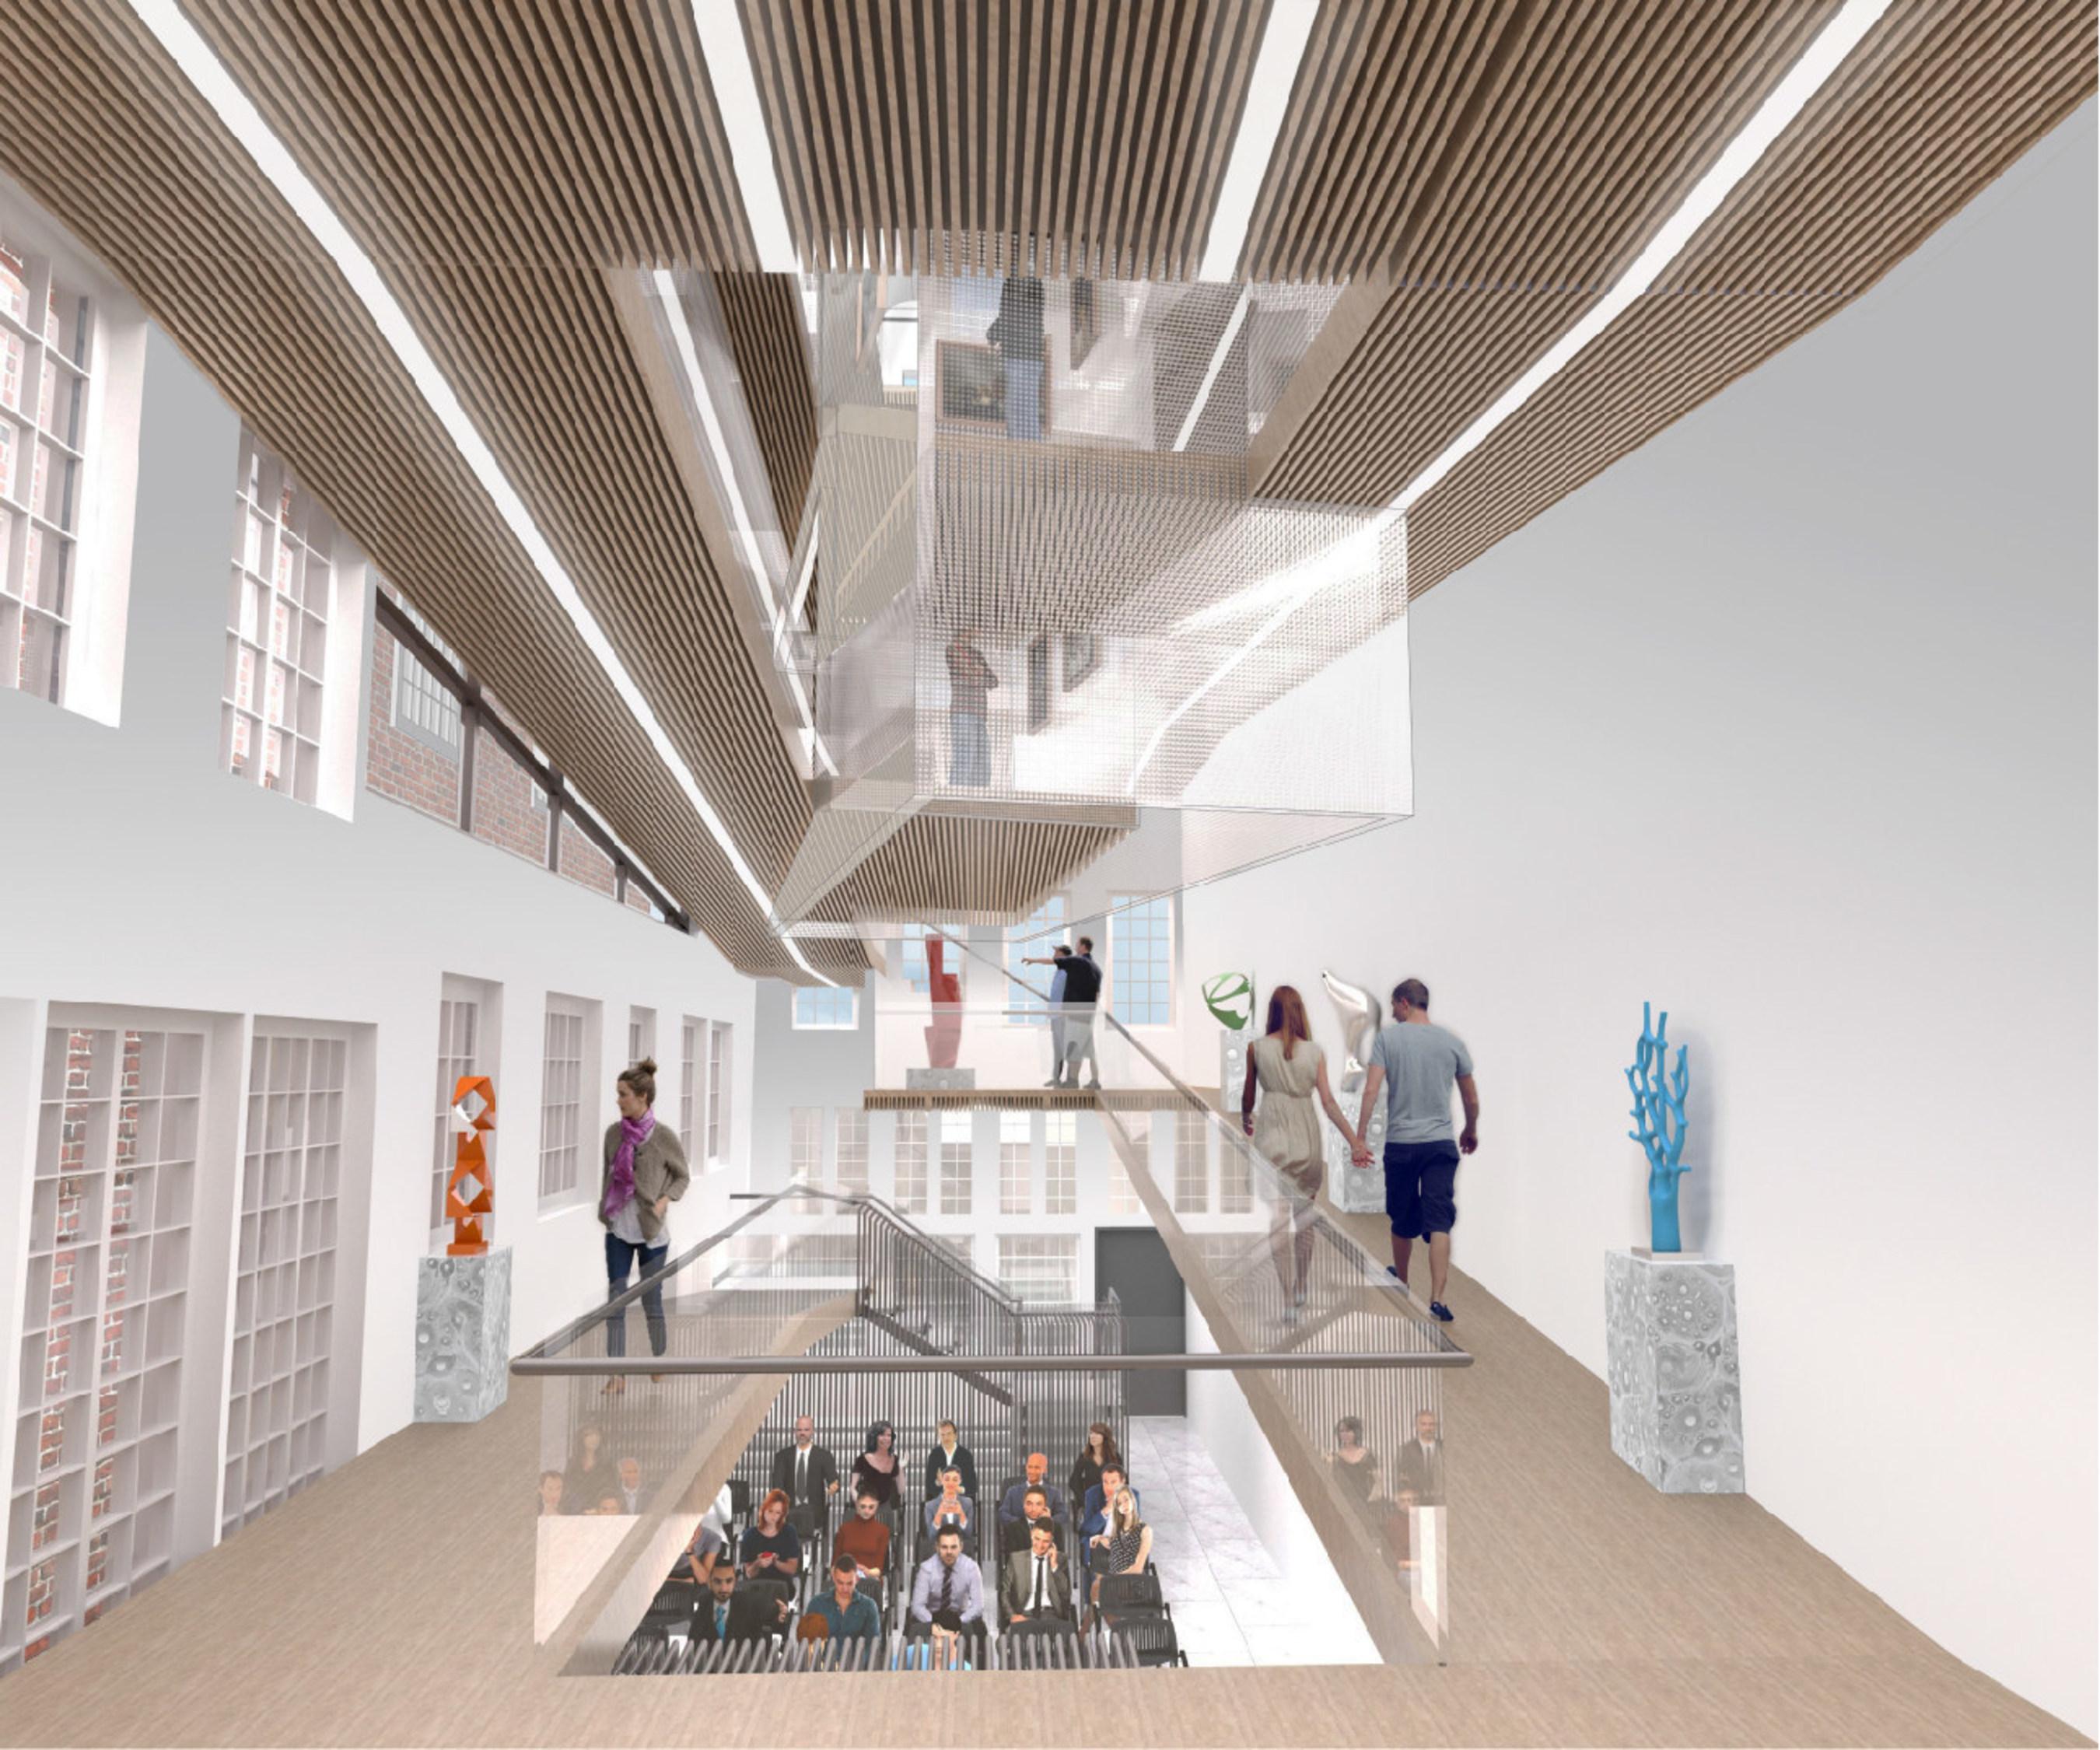 Woodbury Architecture Student Yumin Zeng Wins Prestigious 2015 Donghia Foundation Scholarship